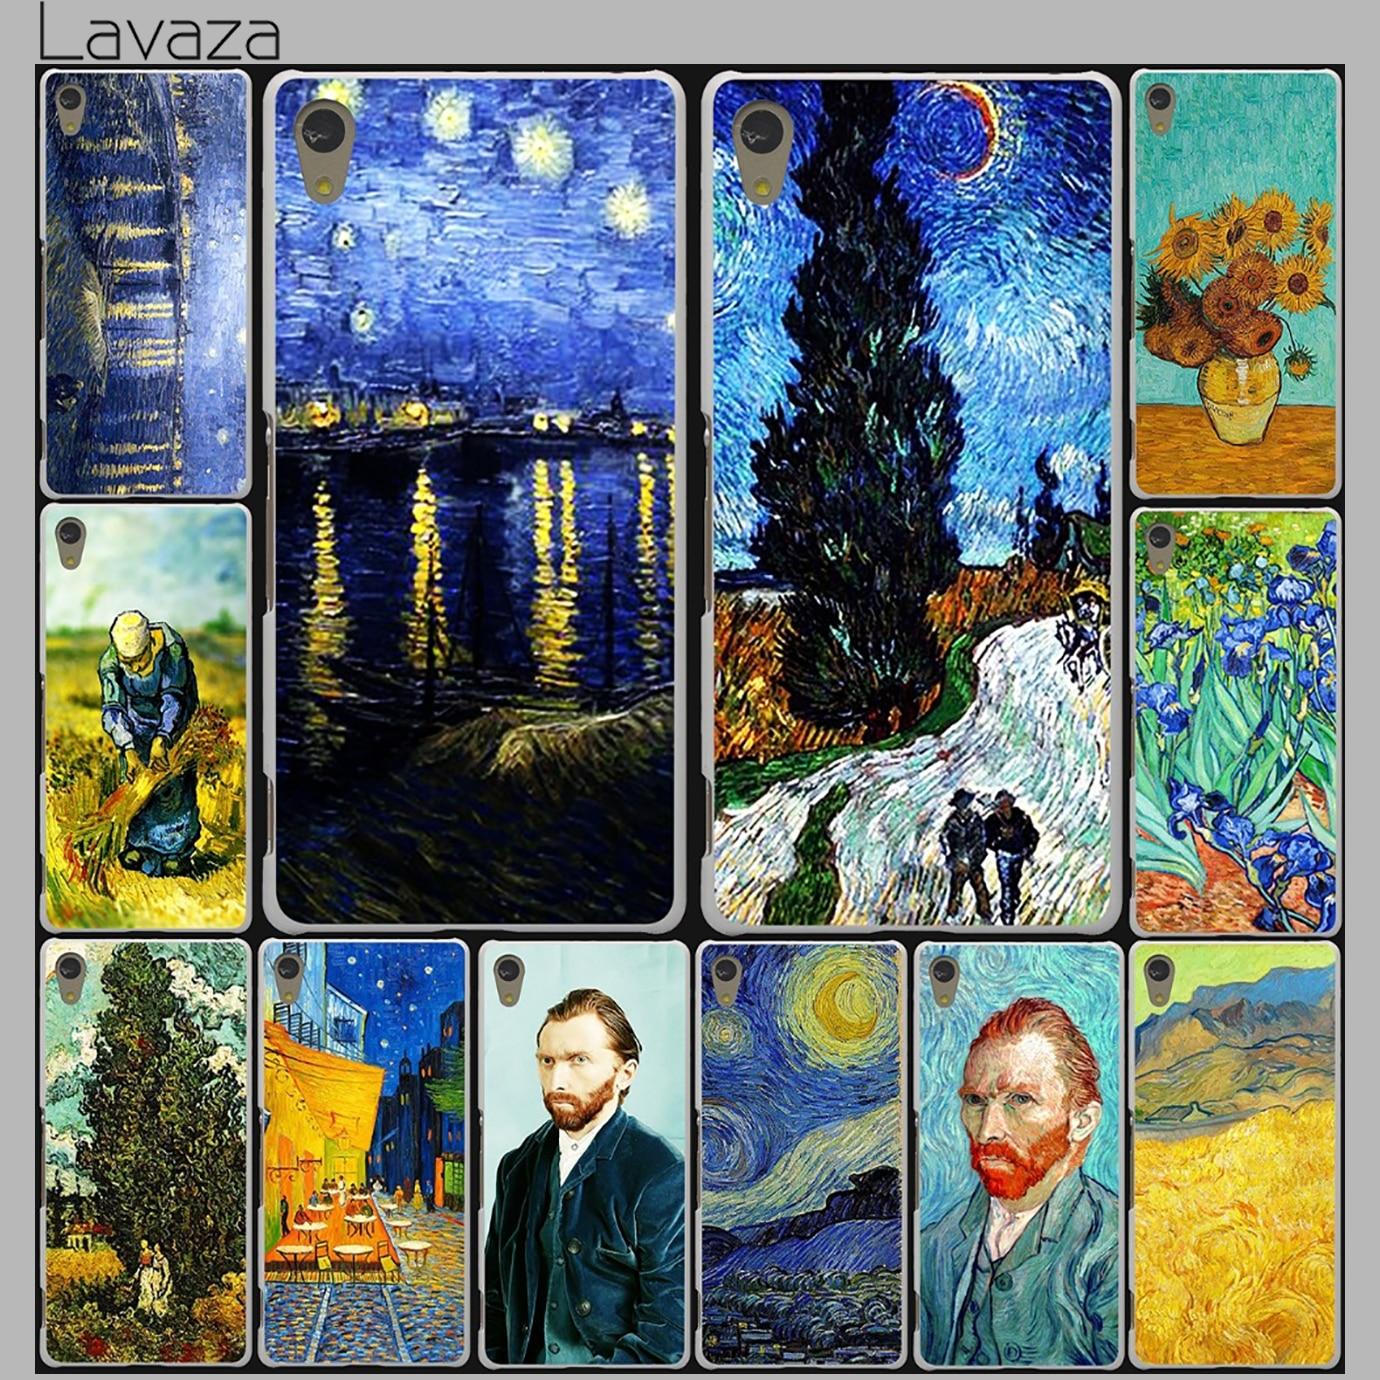 Lavaza Vincent Willem van Gogh Tardis Case for Lenovo Vibe K3 K4 K5 K6 Note A1000 A2010 S90 S850 S60 A536 A328 X3 Lite P1